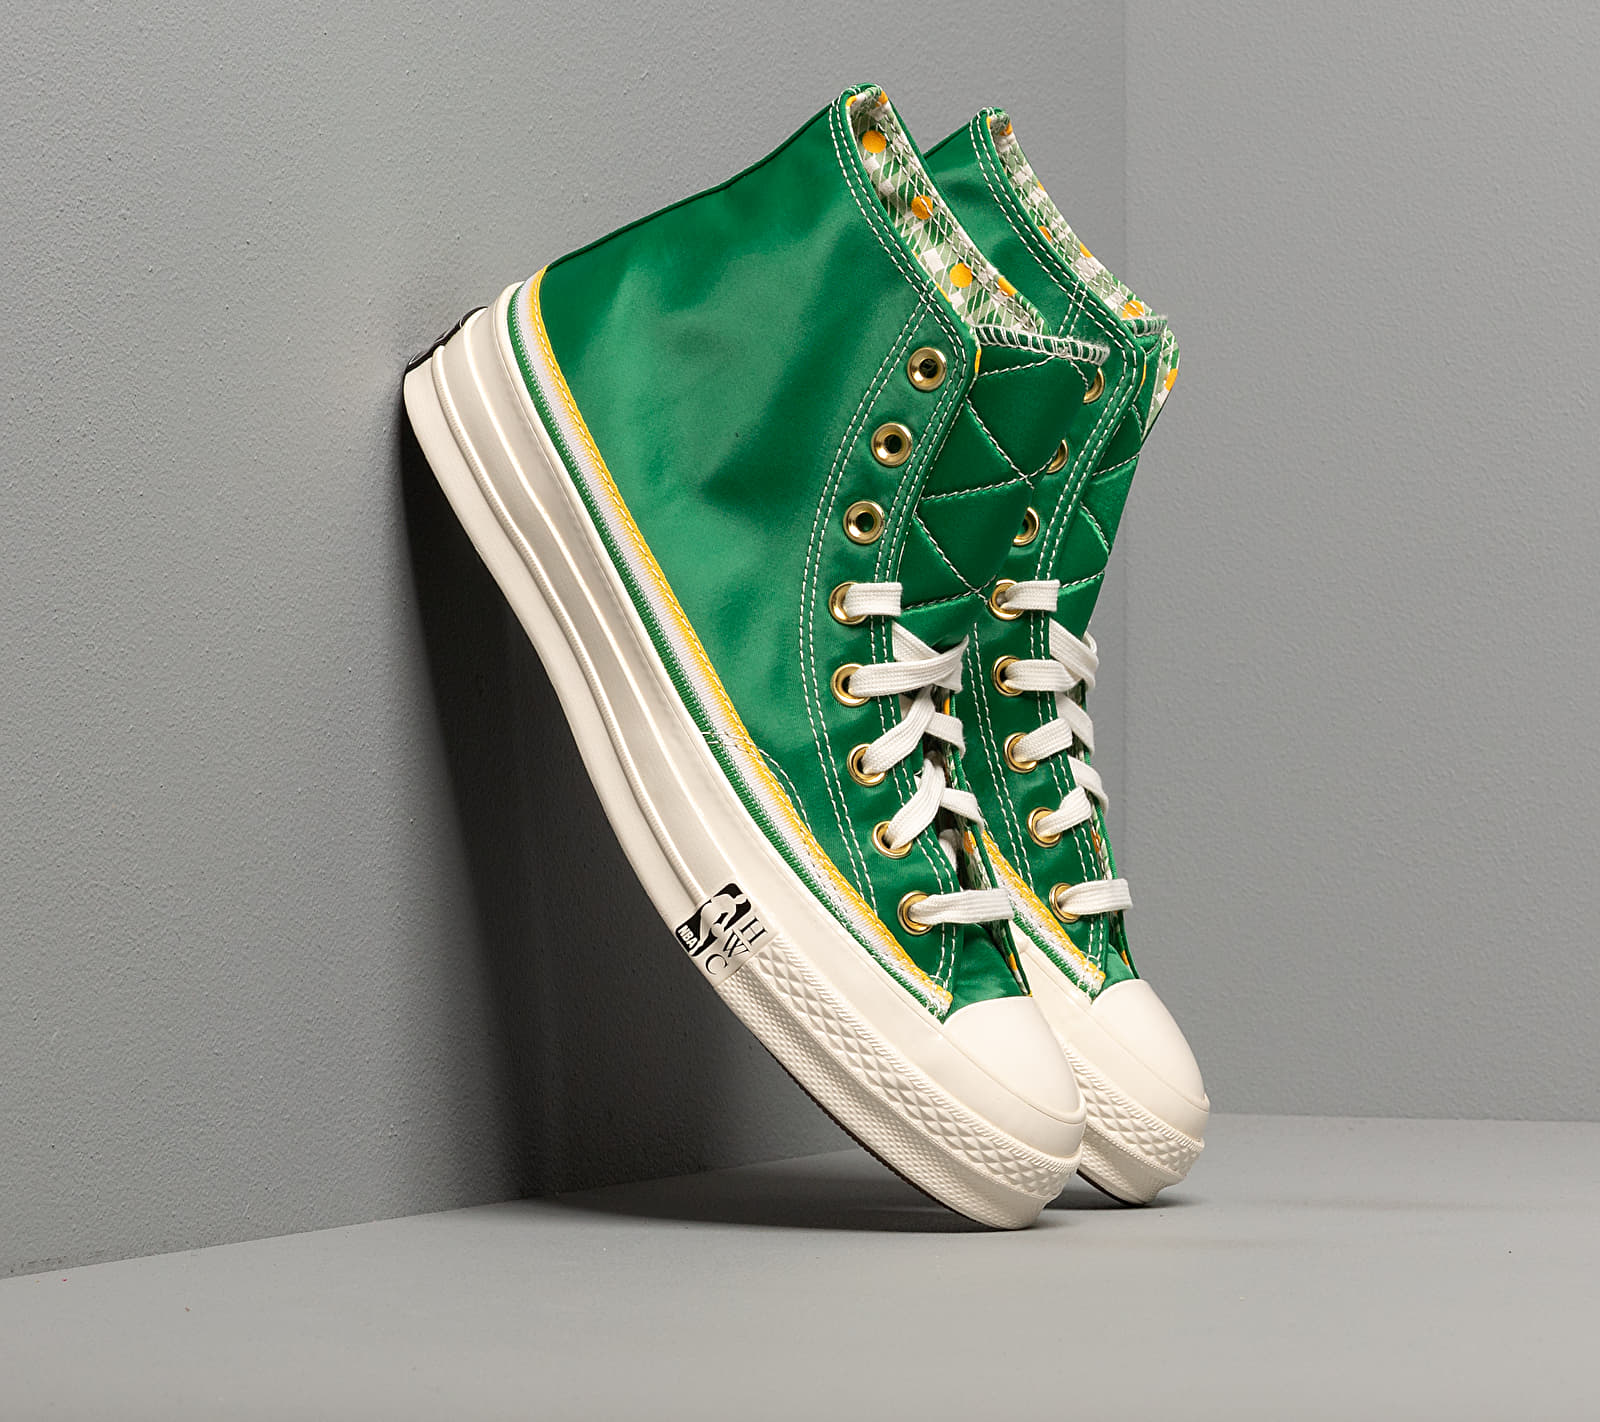 Converse Chuck 70 Green/ Yellow 167060C